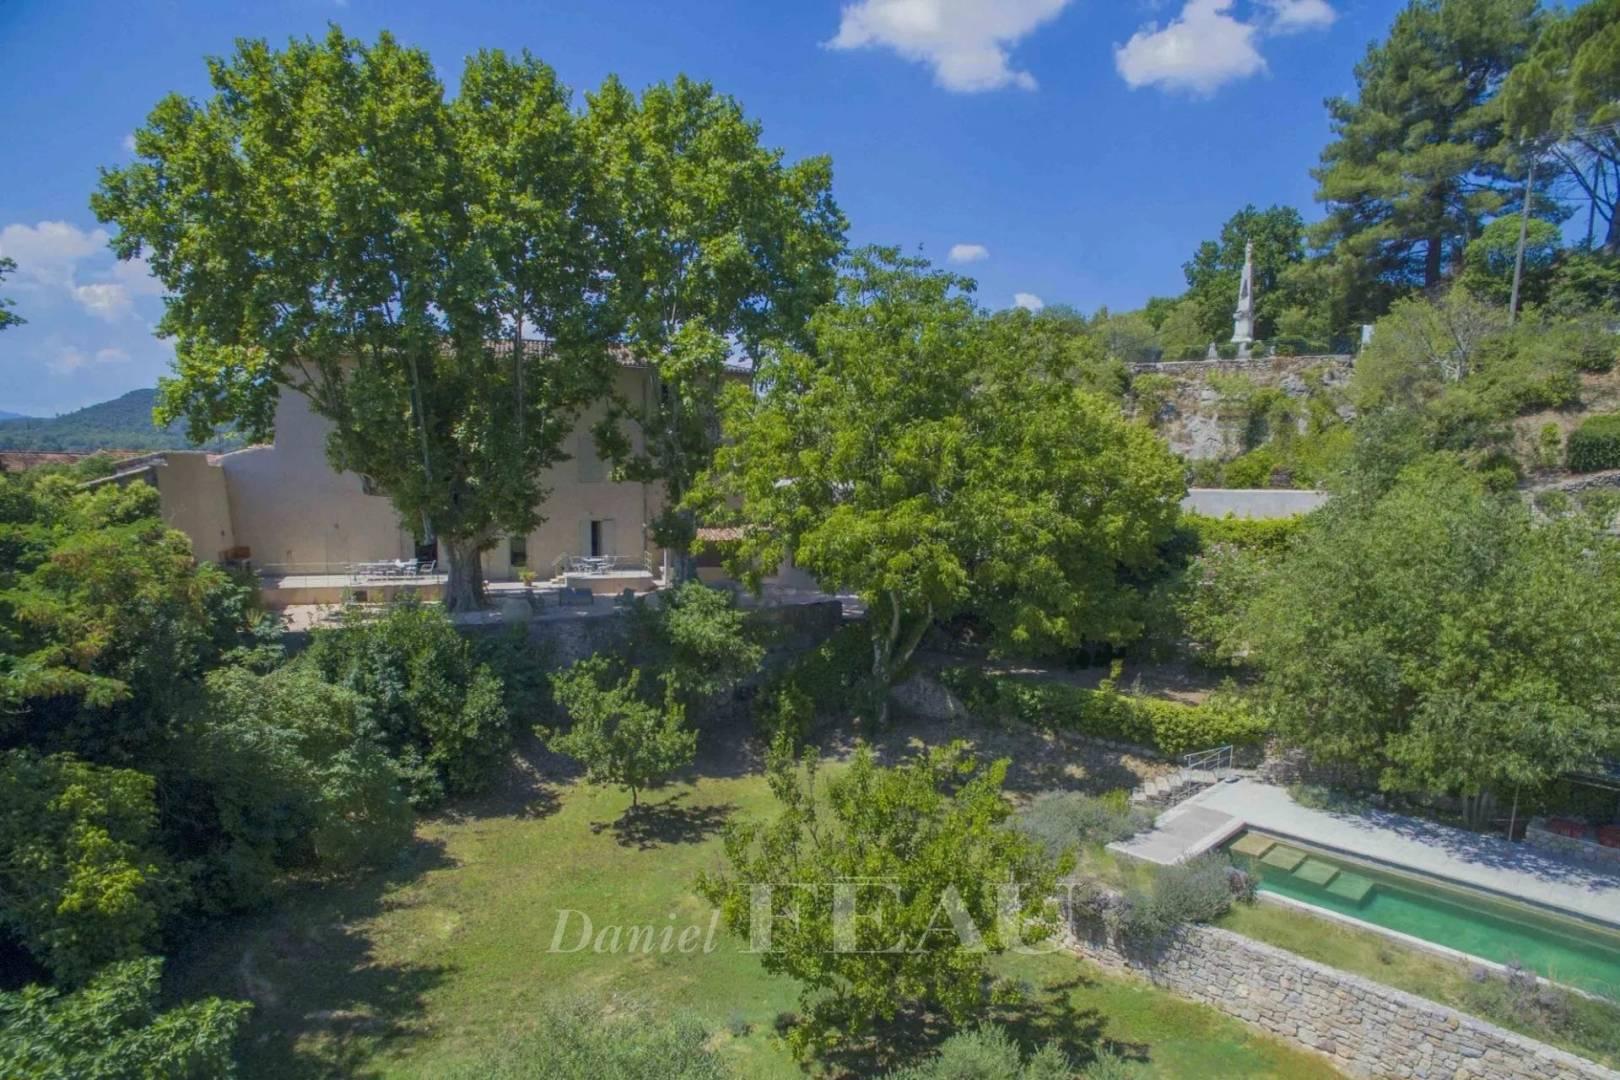 1 47 Montfort-sur-Argens